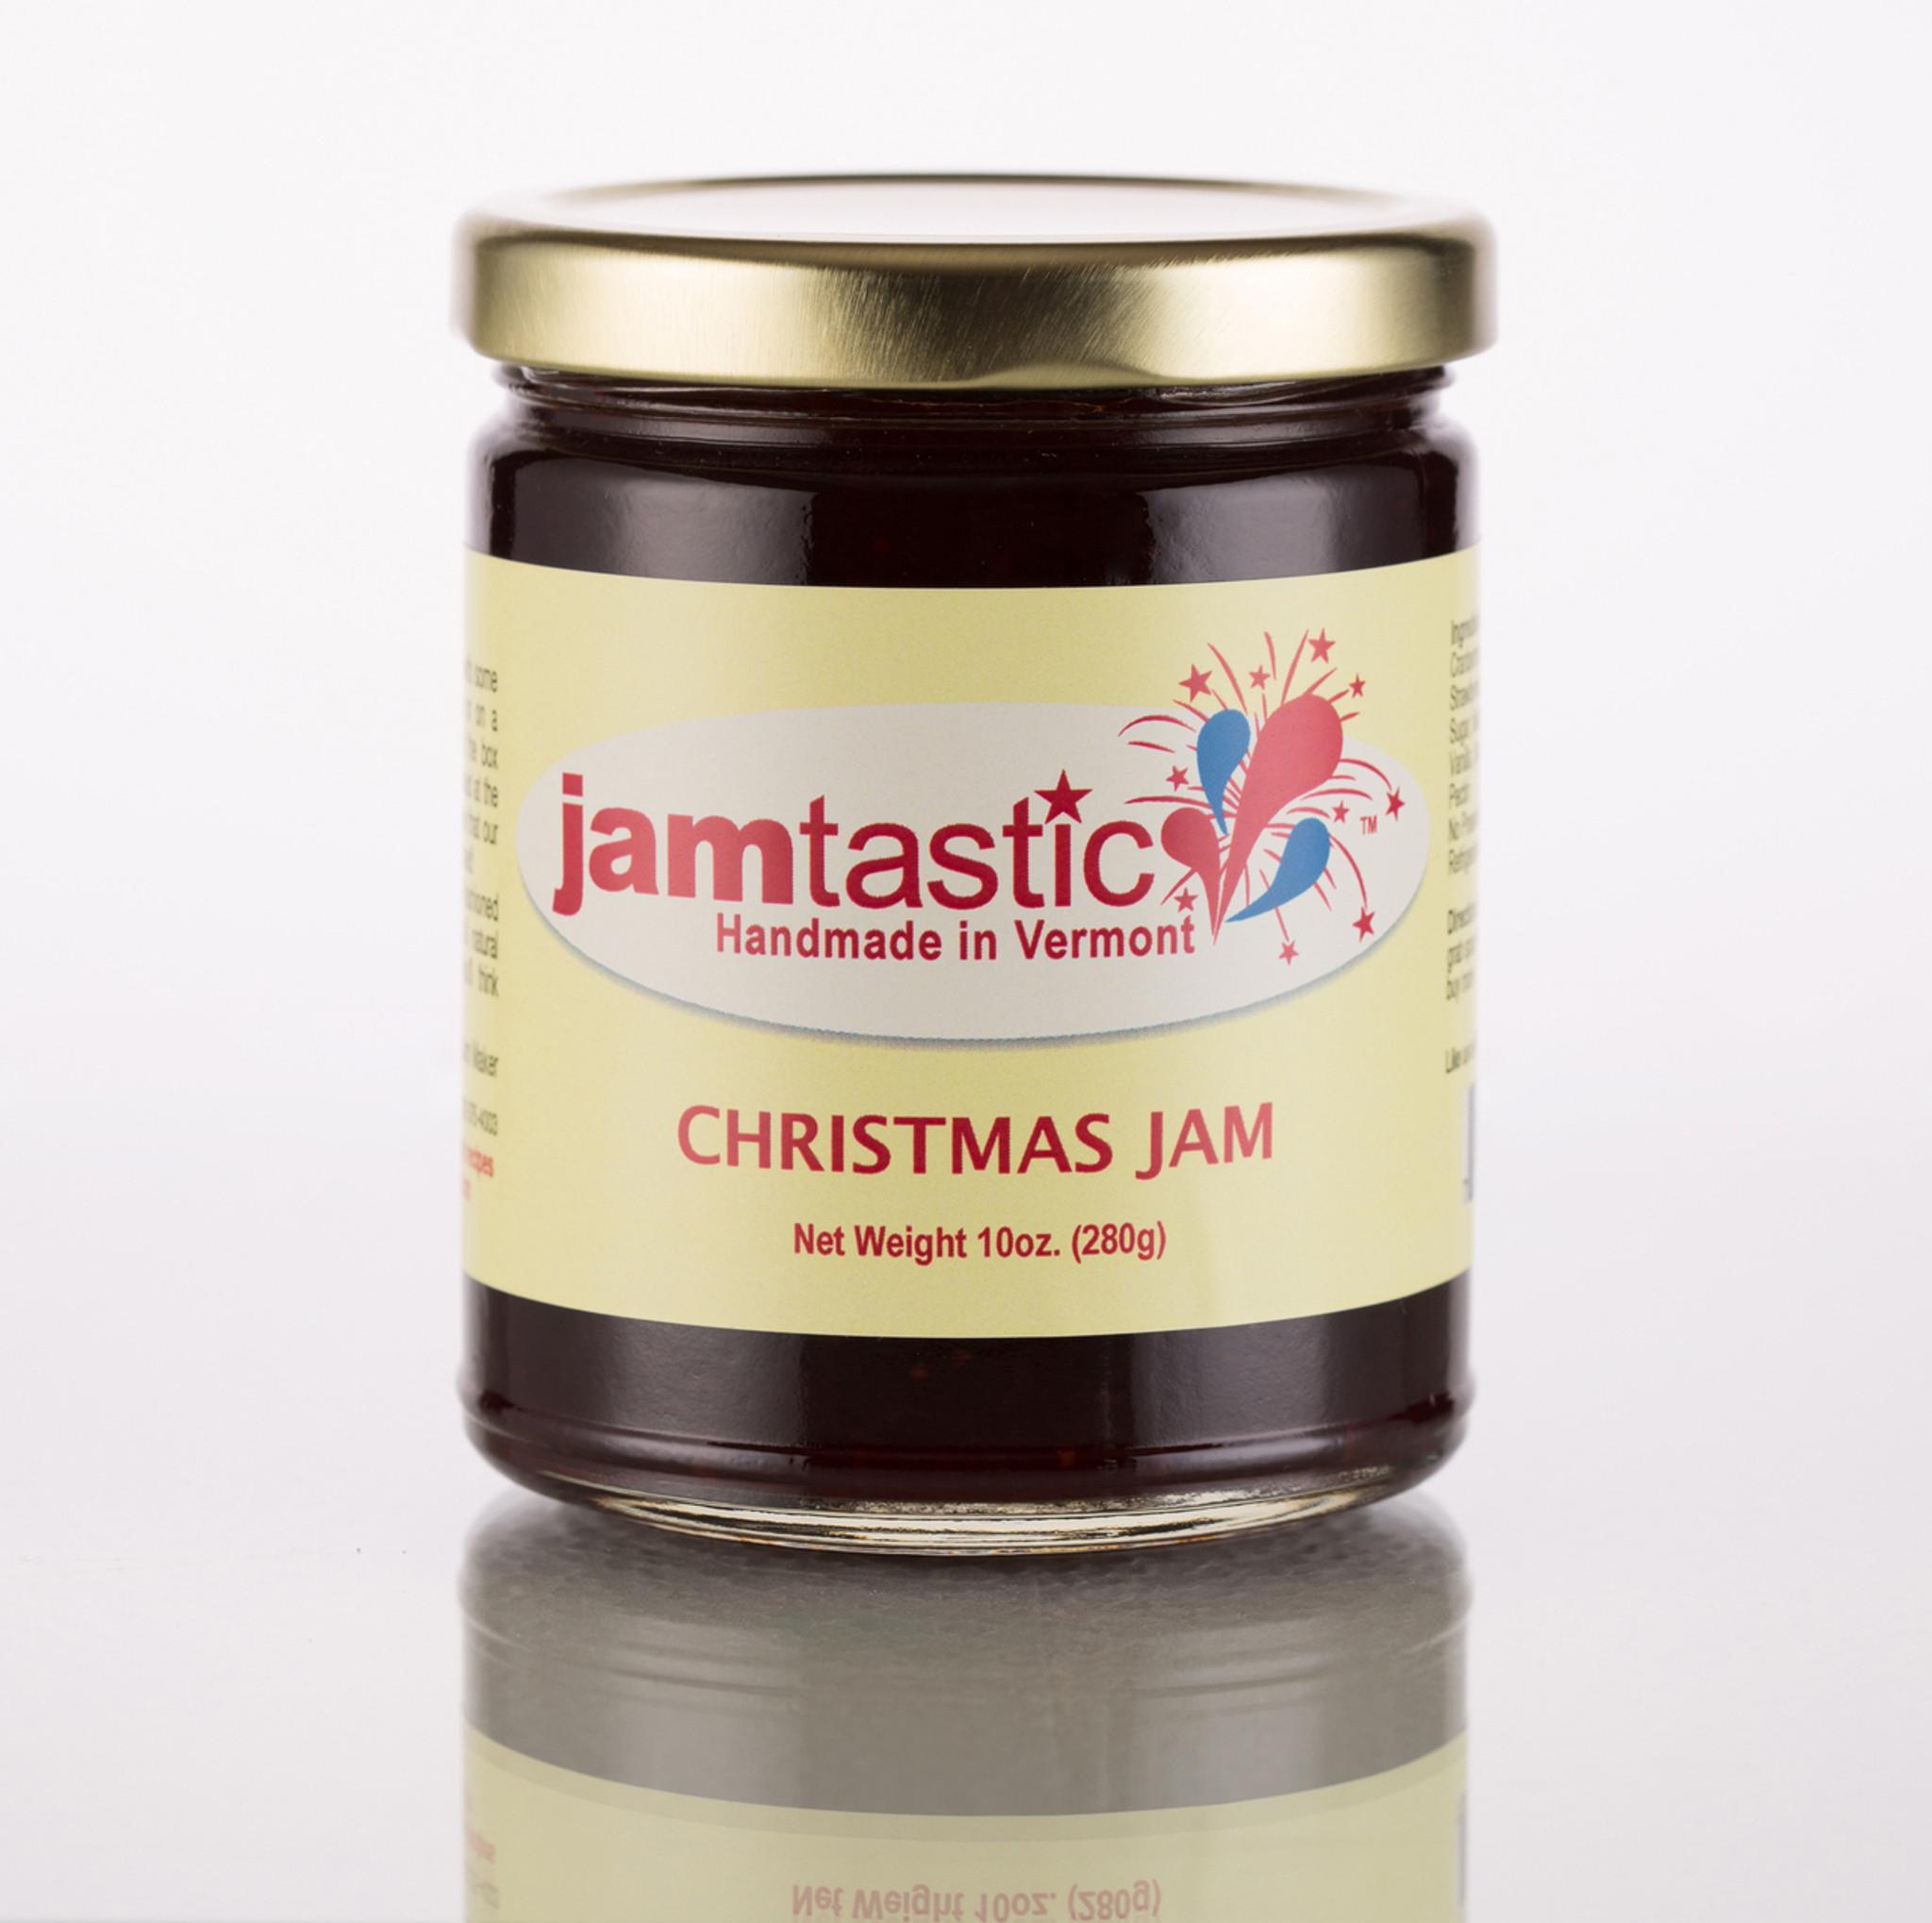 Christmas Jam - Jamtastic